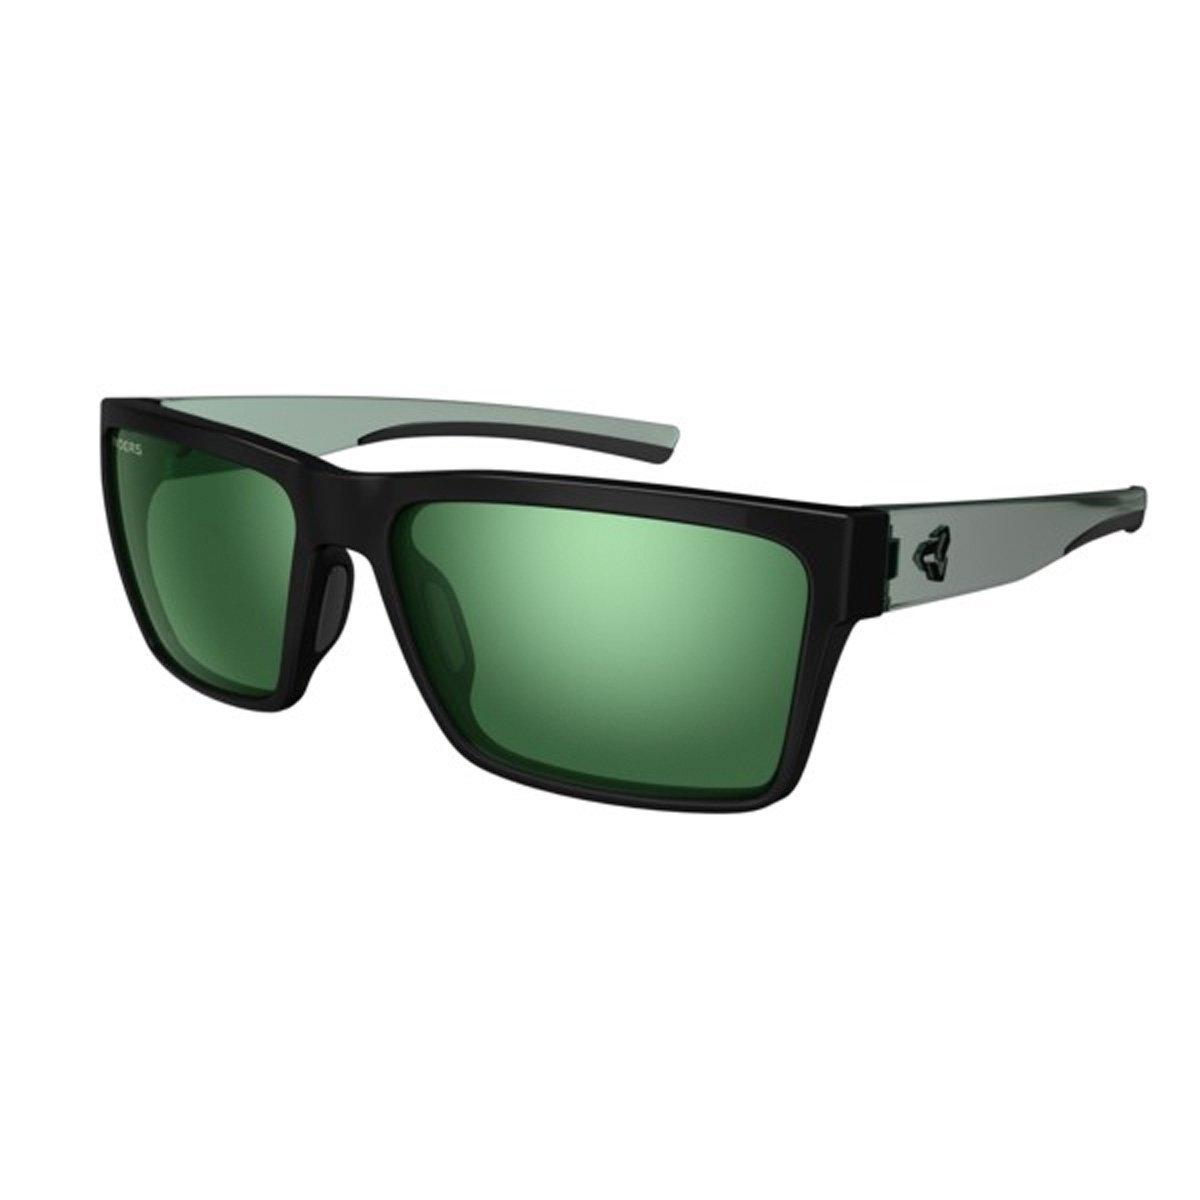 Ryders Eyewear Nelson Sunglasses